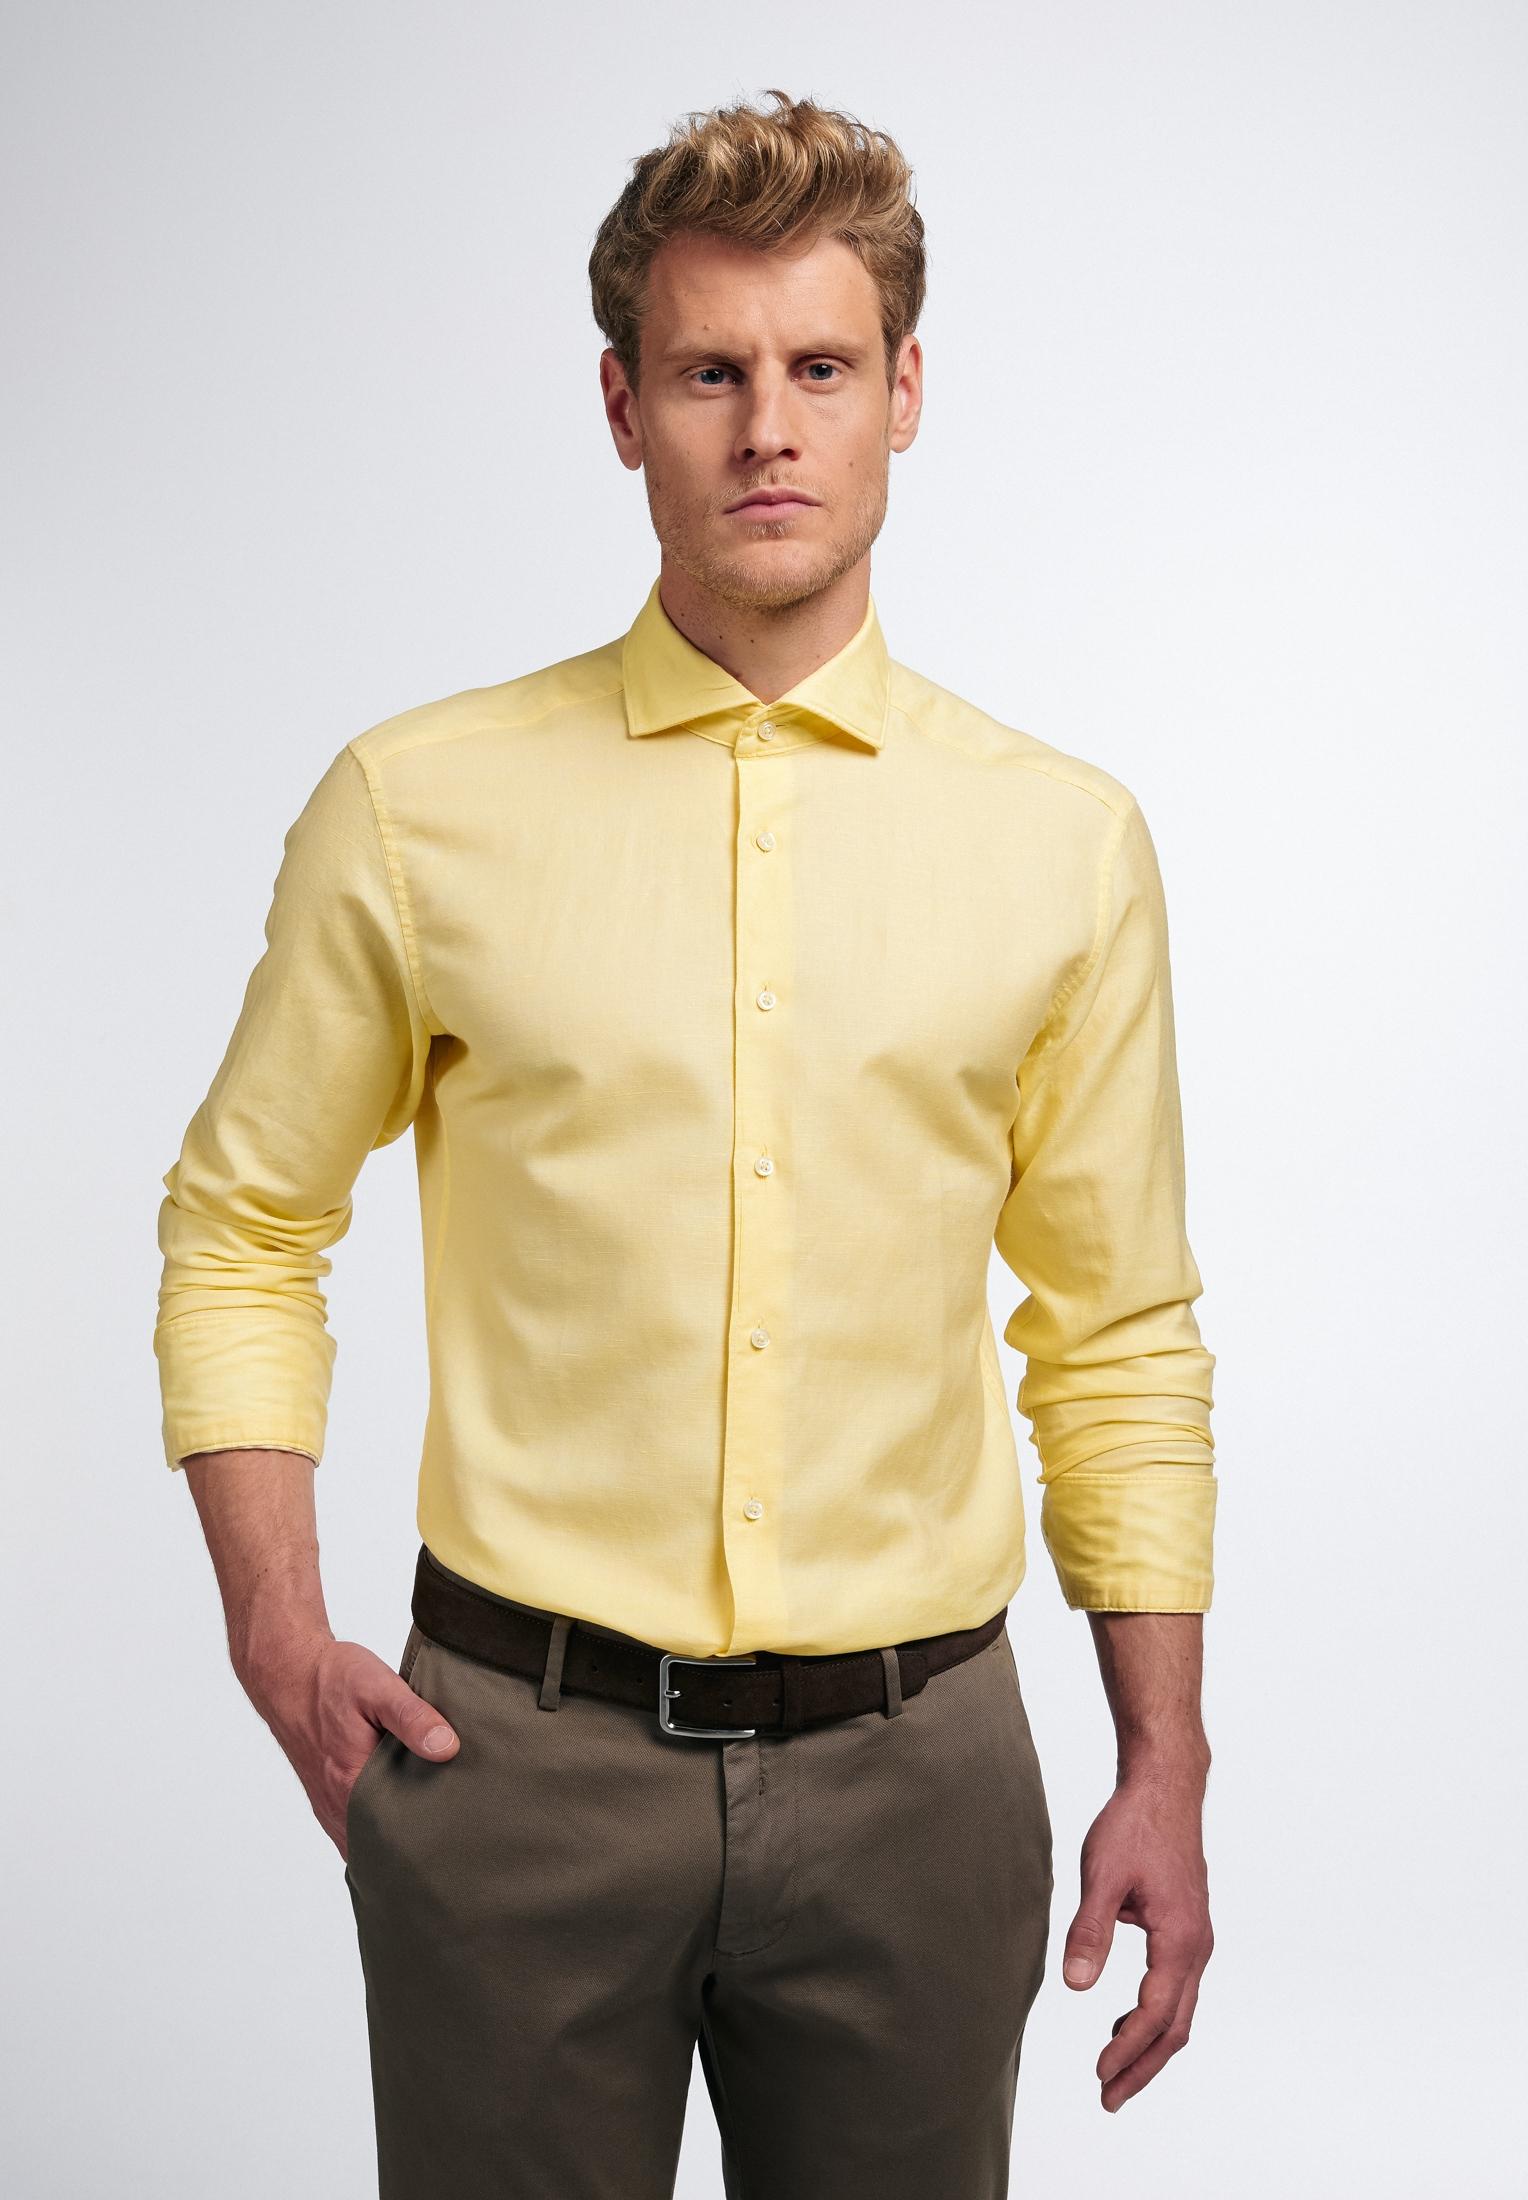 Eterna Businesshemd SLIM FIT, Langarm gelb Herren Business Hemden Businessmode